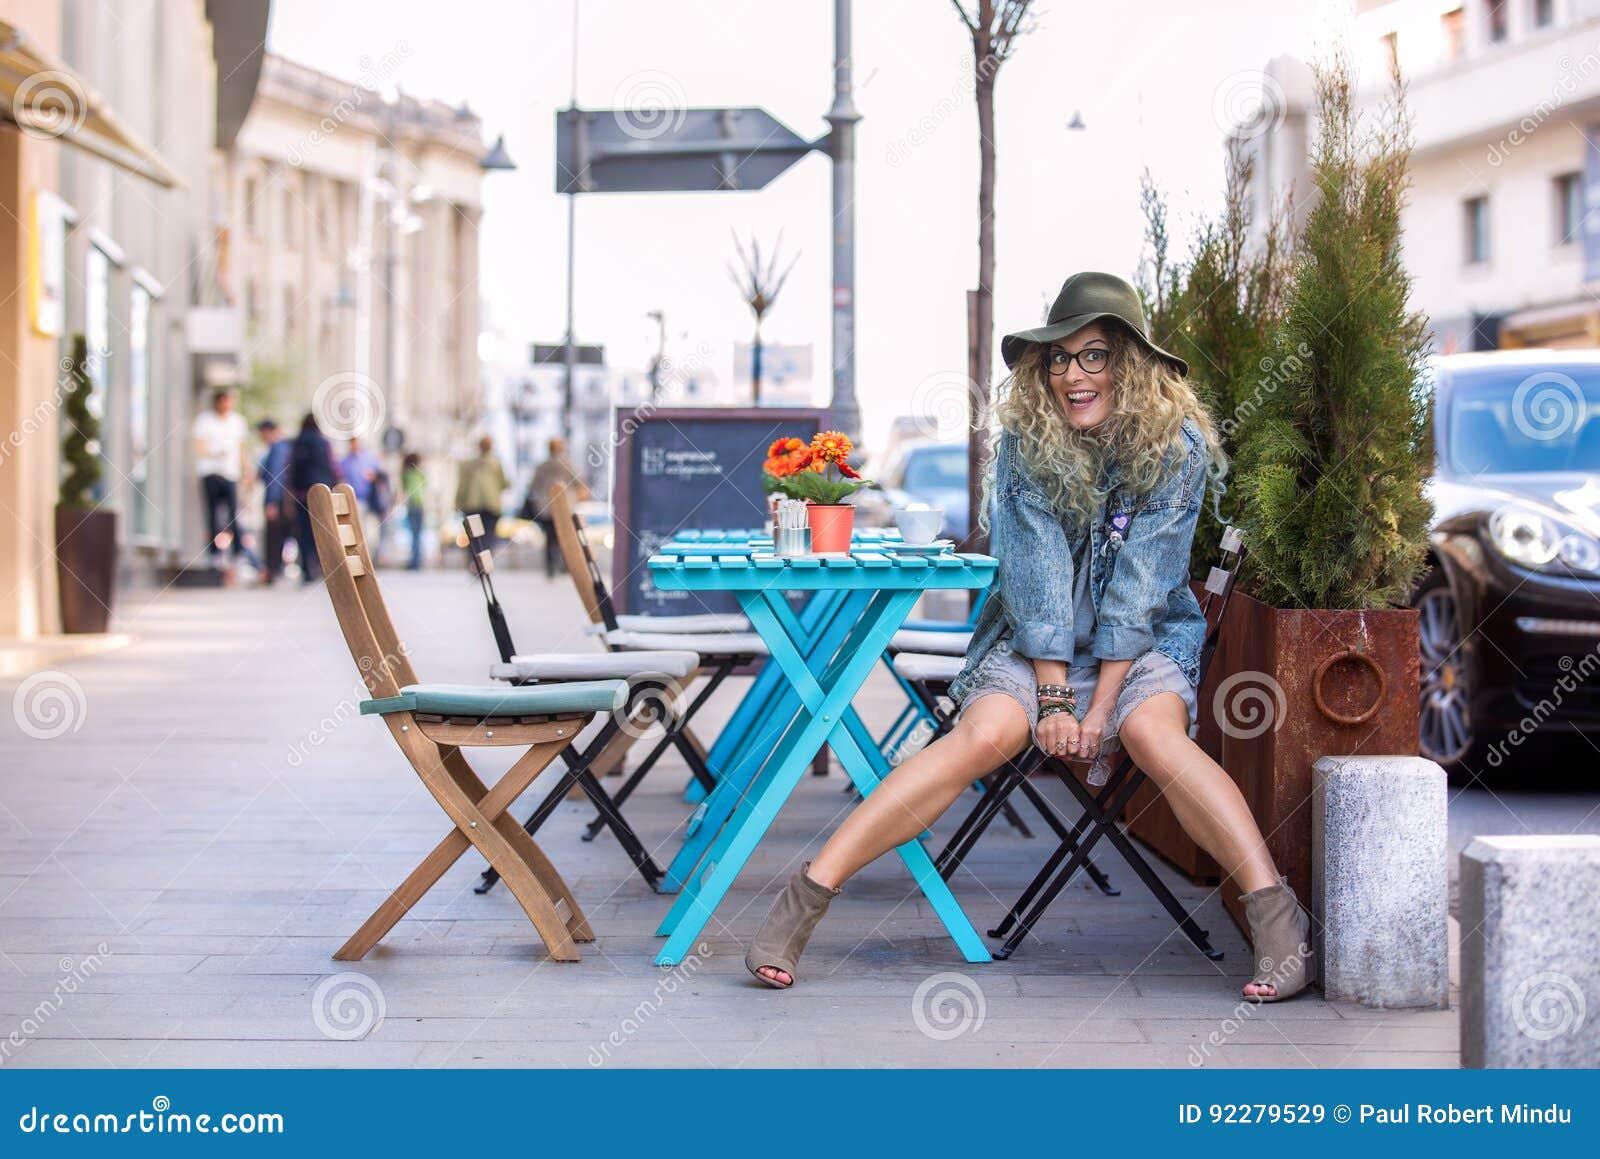 Menina louca na tabela que bebe uma xícara de café na cidade